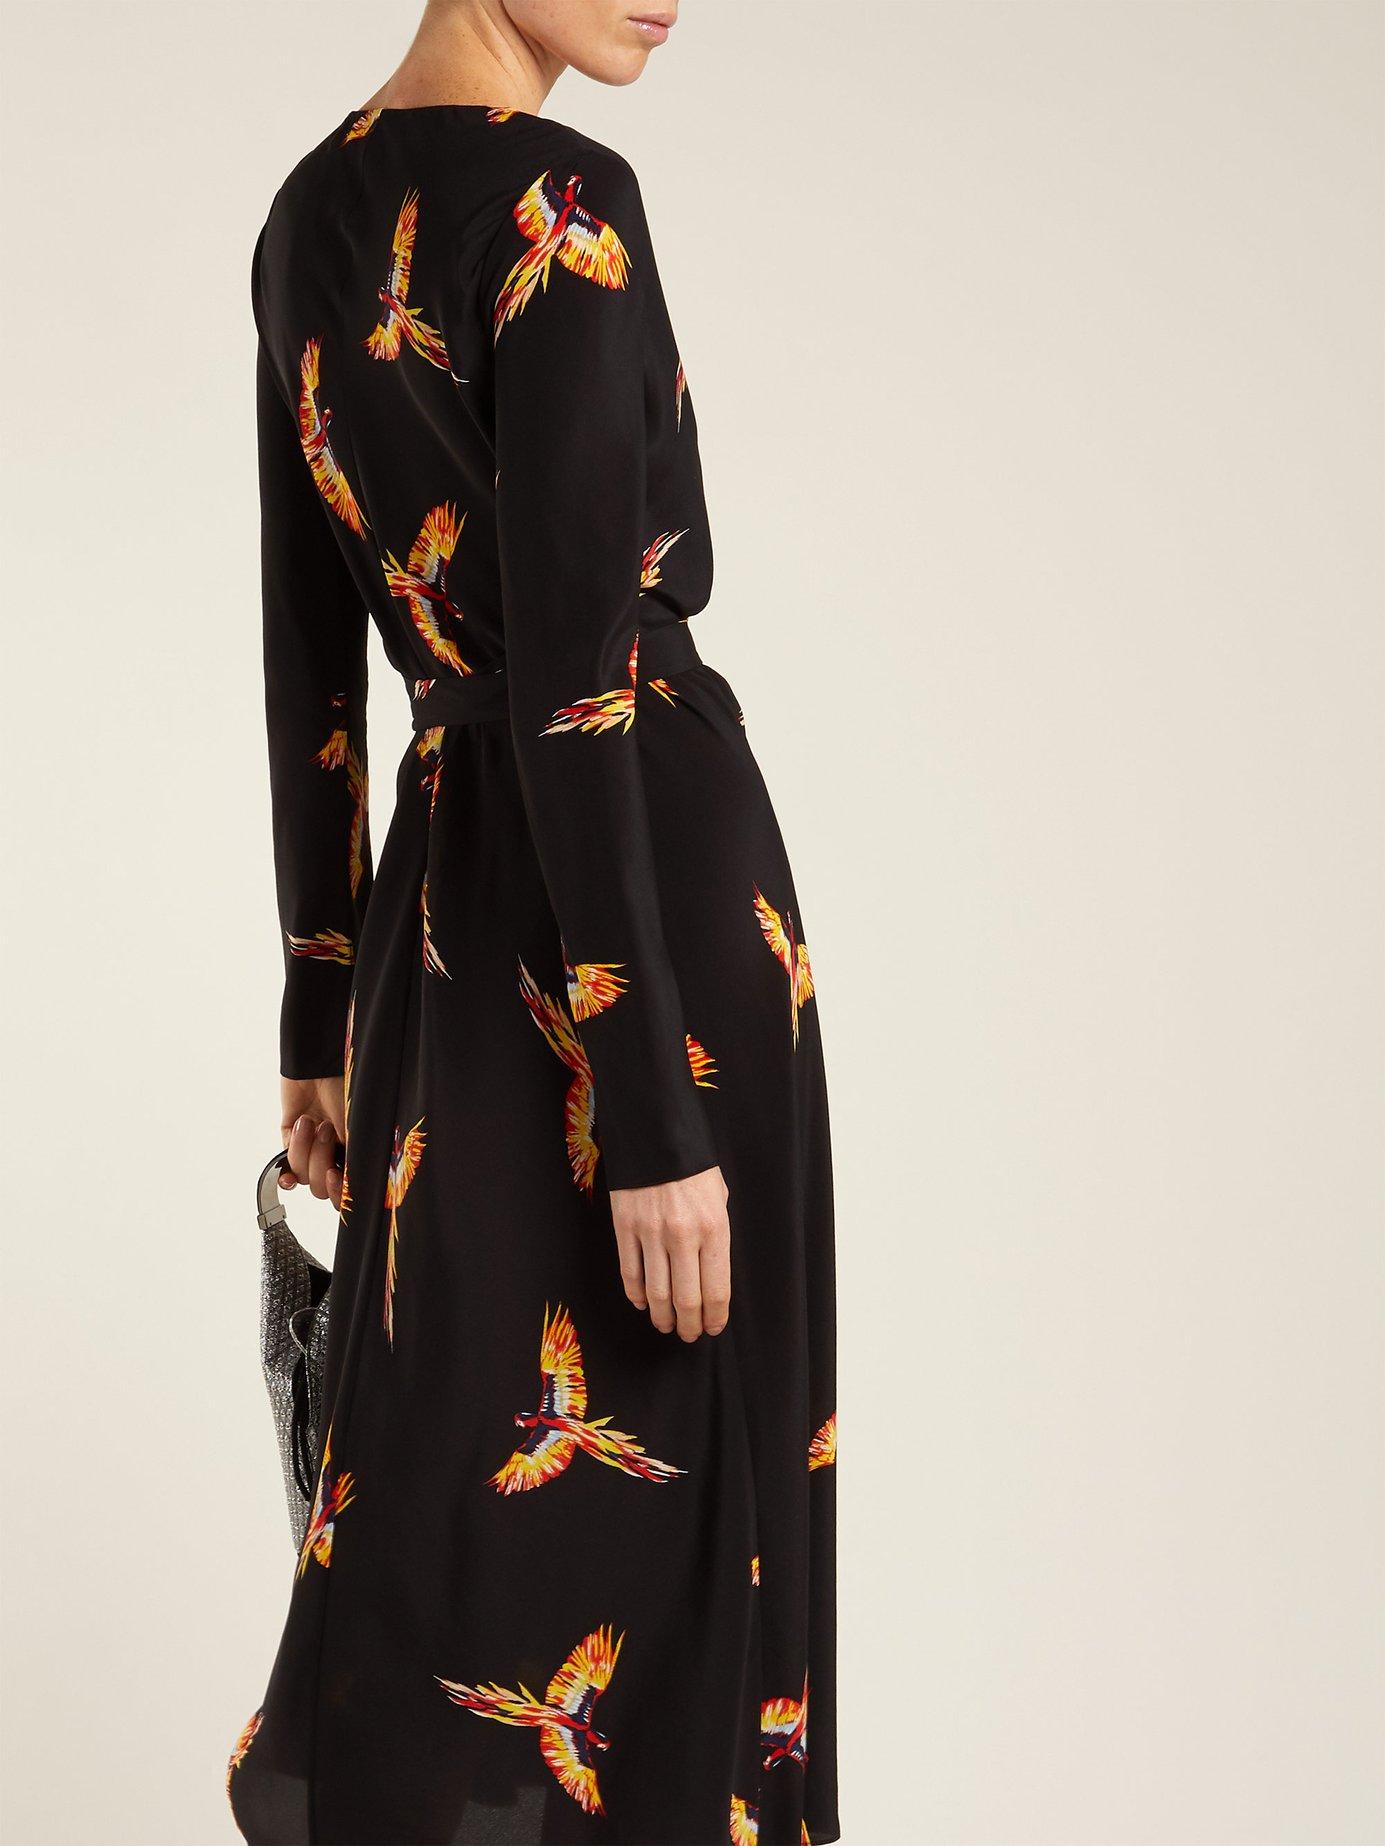 Tilly parrot-print silk crepe de Chine wrap dress by Diane Von Furstenberg